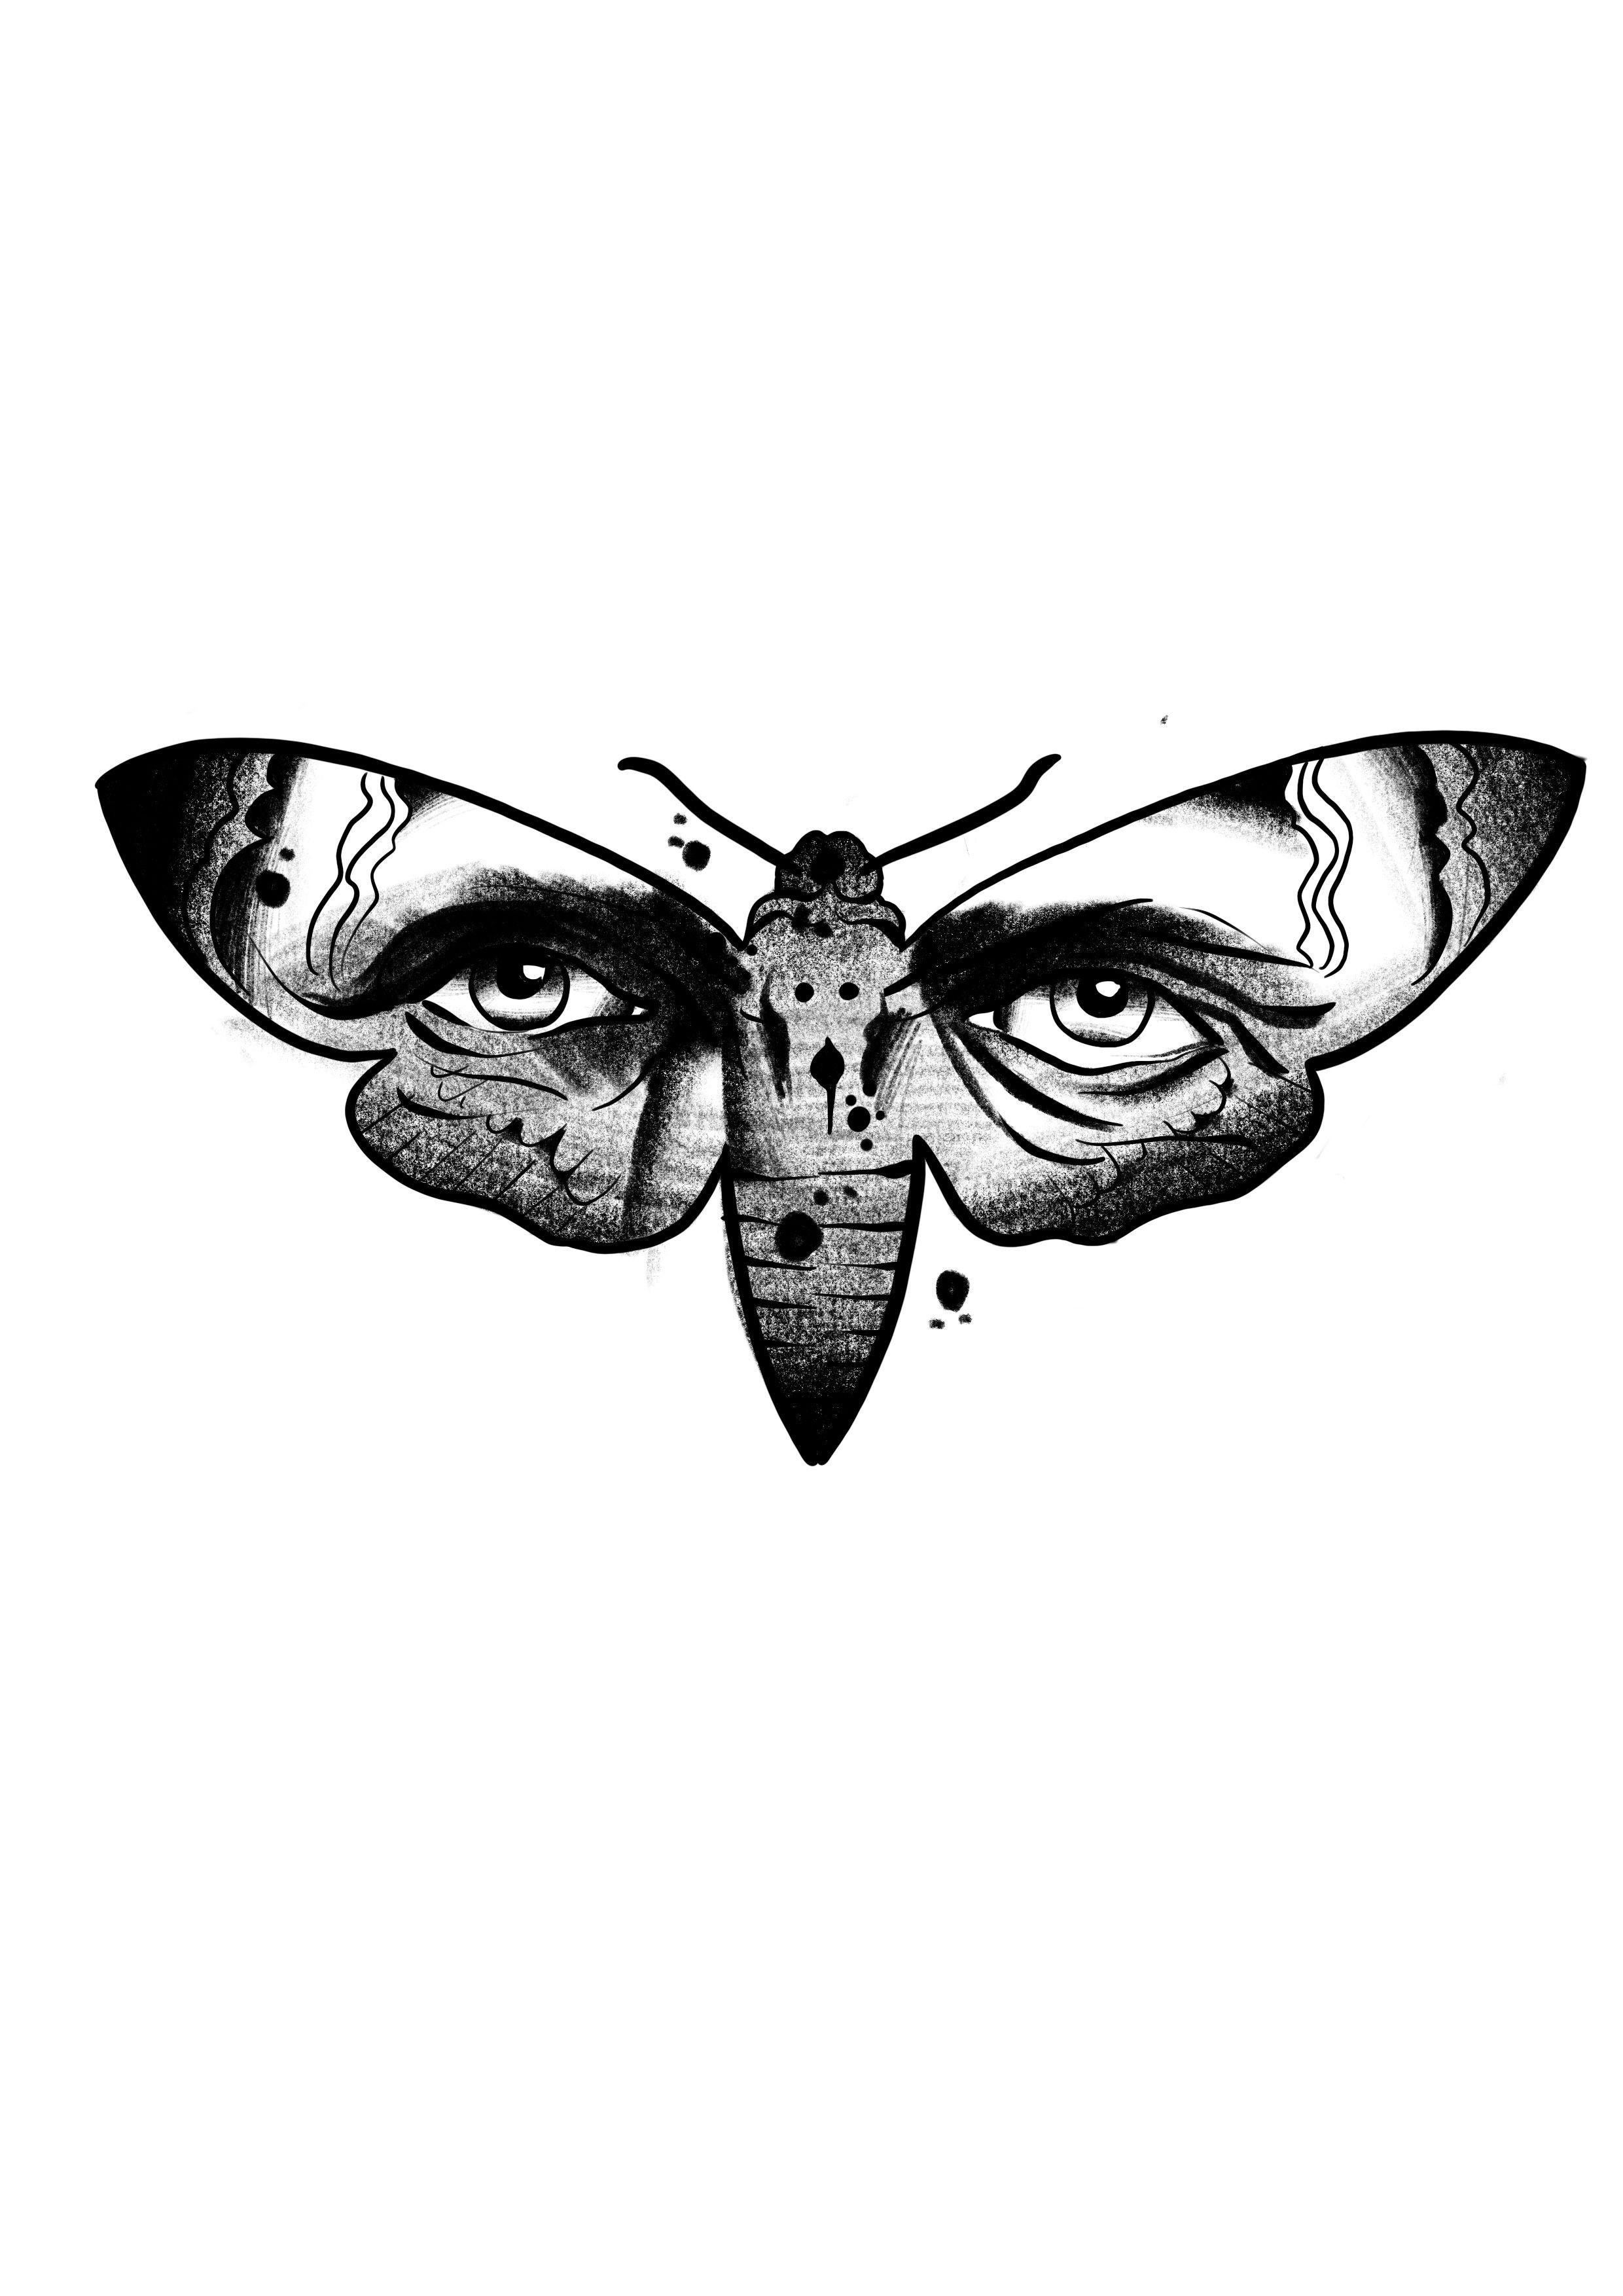 Silence Of The Lamb Movie Tattoos Scary Tattoos Horror Movie Tattoos